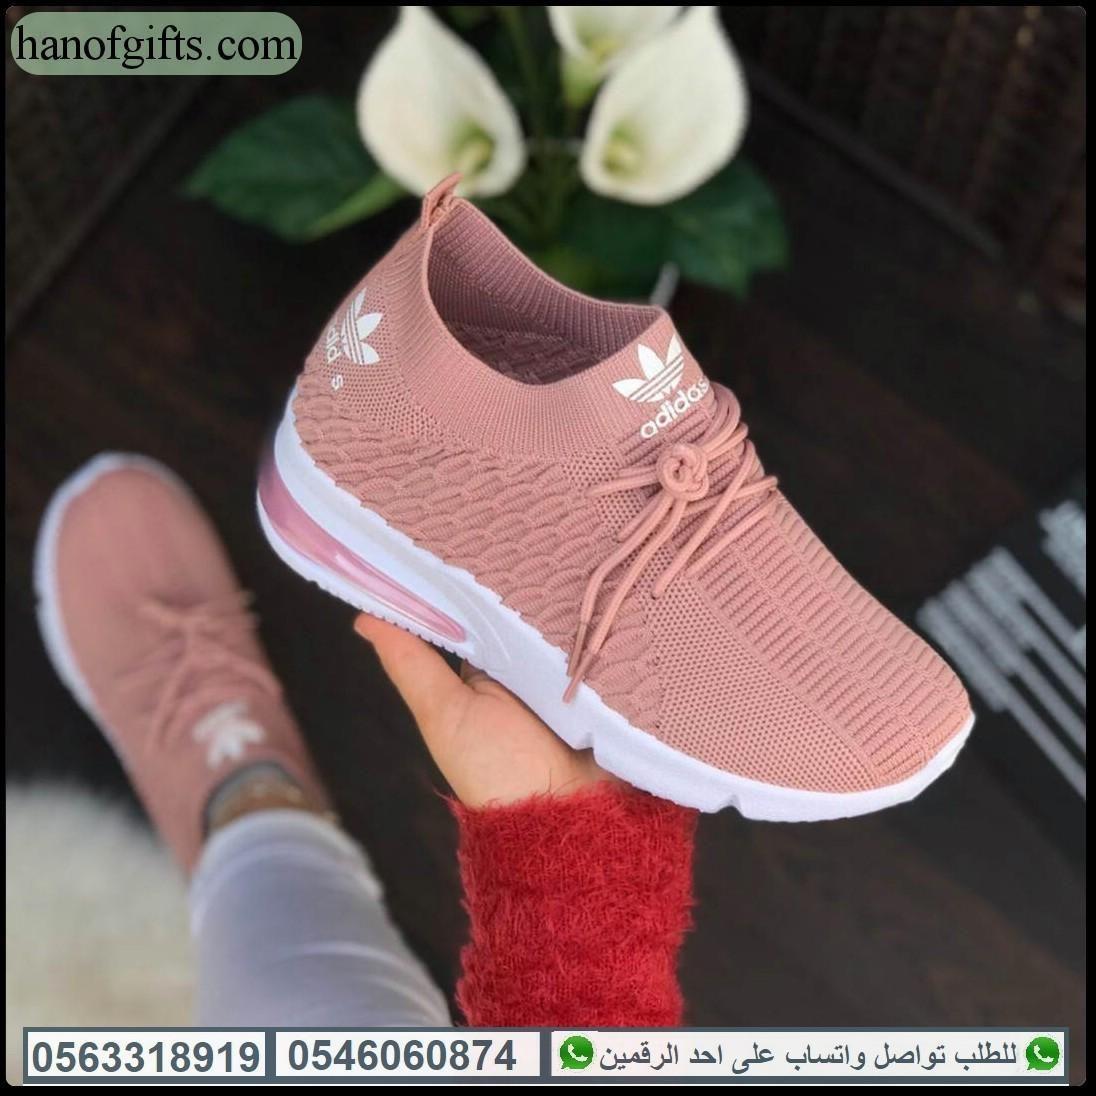 شوزات اديداس نسائي Adidas كل المقاسات من 36 الى 41 هدايا هنوف In 2020 Jordan Shoes Fashion Sneakers